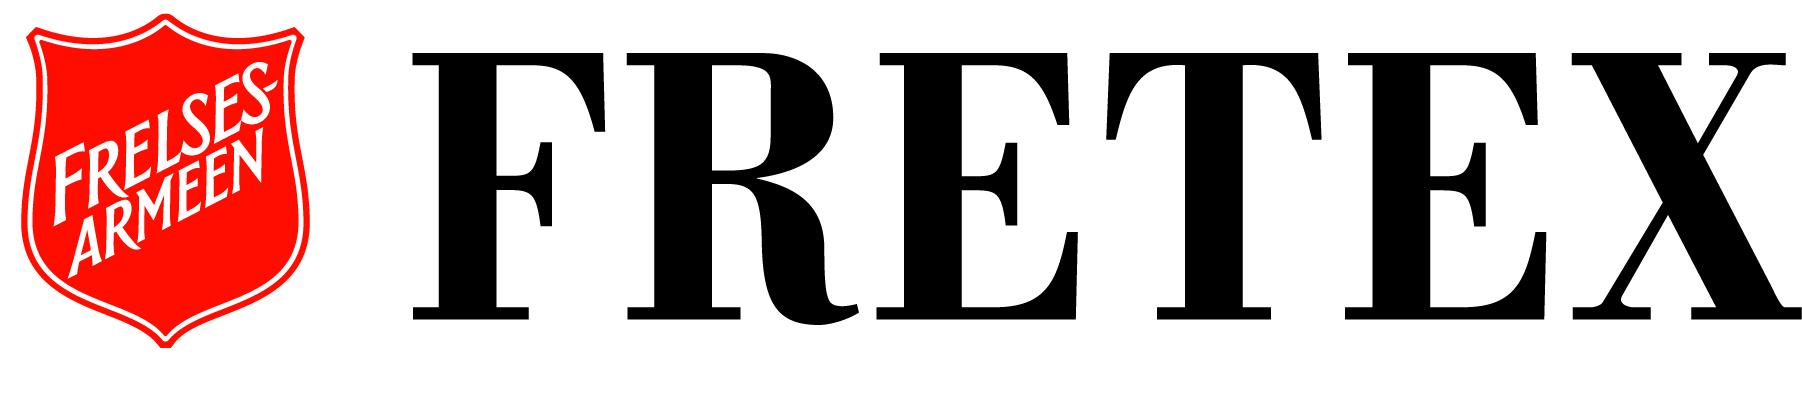 Fretex